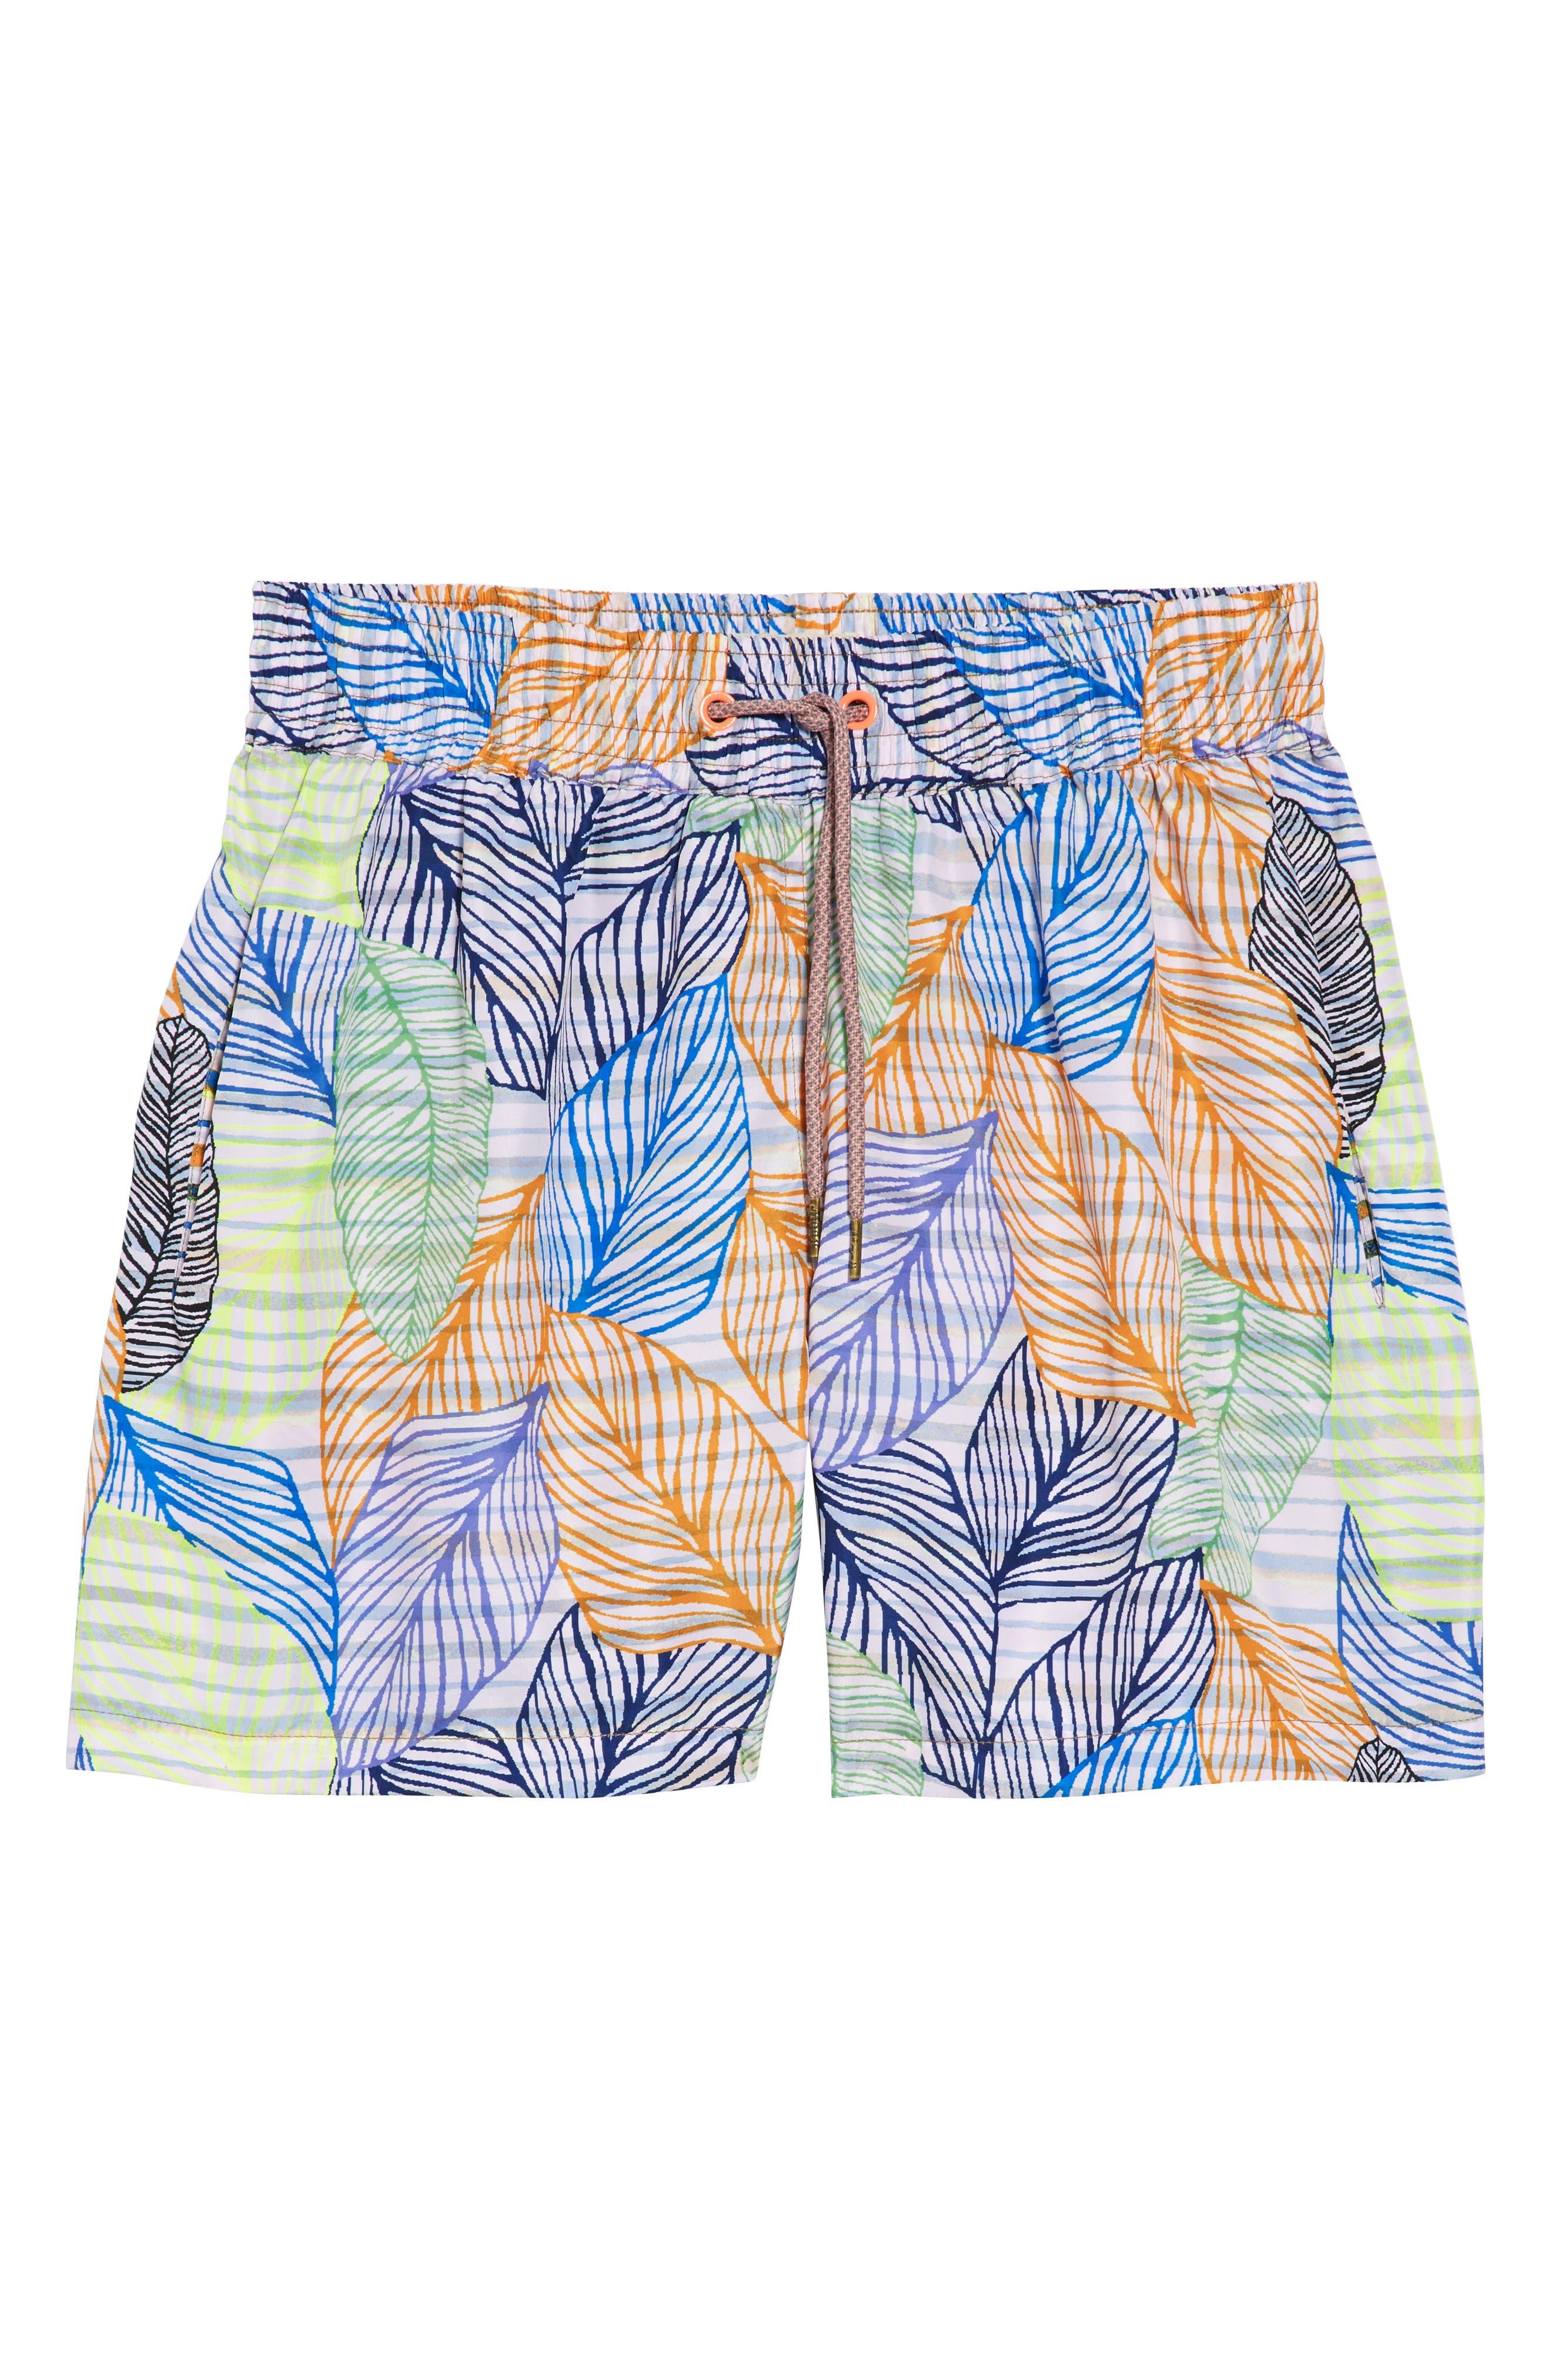 Blue Sky Reversible Swim Trunks,                             Alternate thumbnail 7, color,                             MULTICOLOR